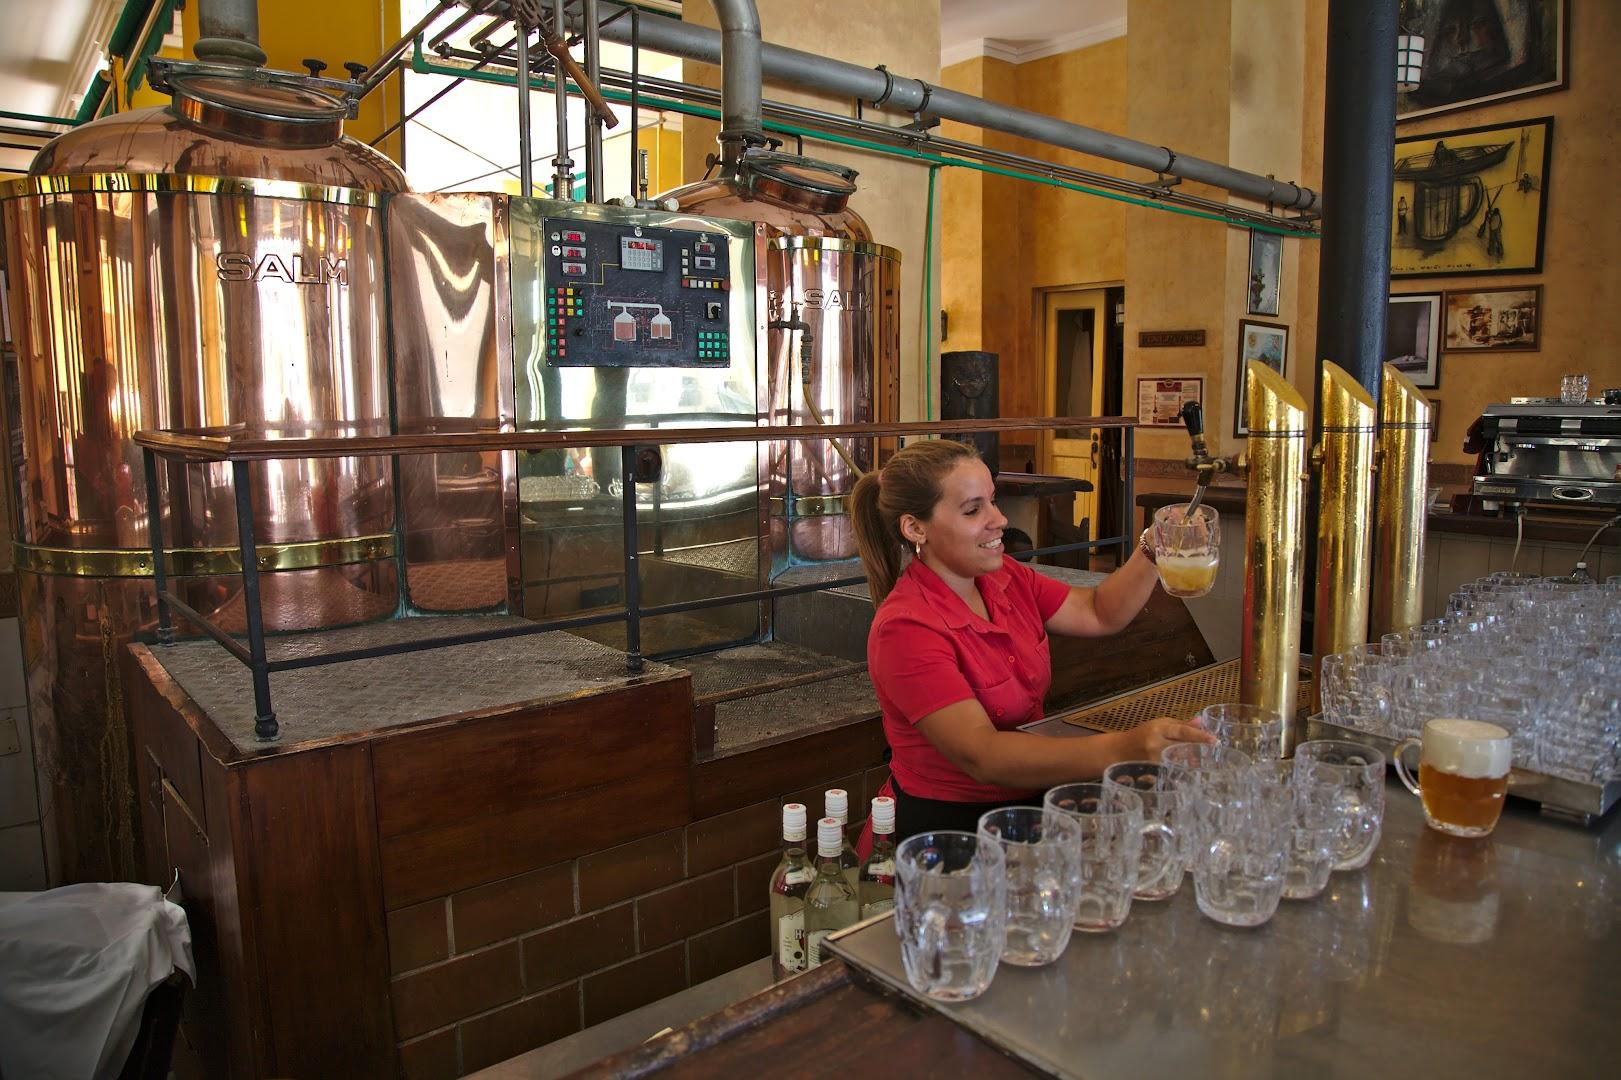 Locally brewed German-style beer